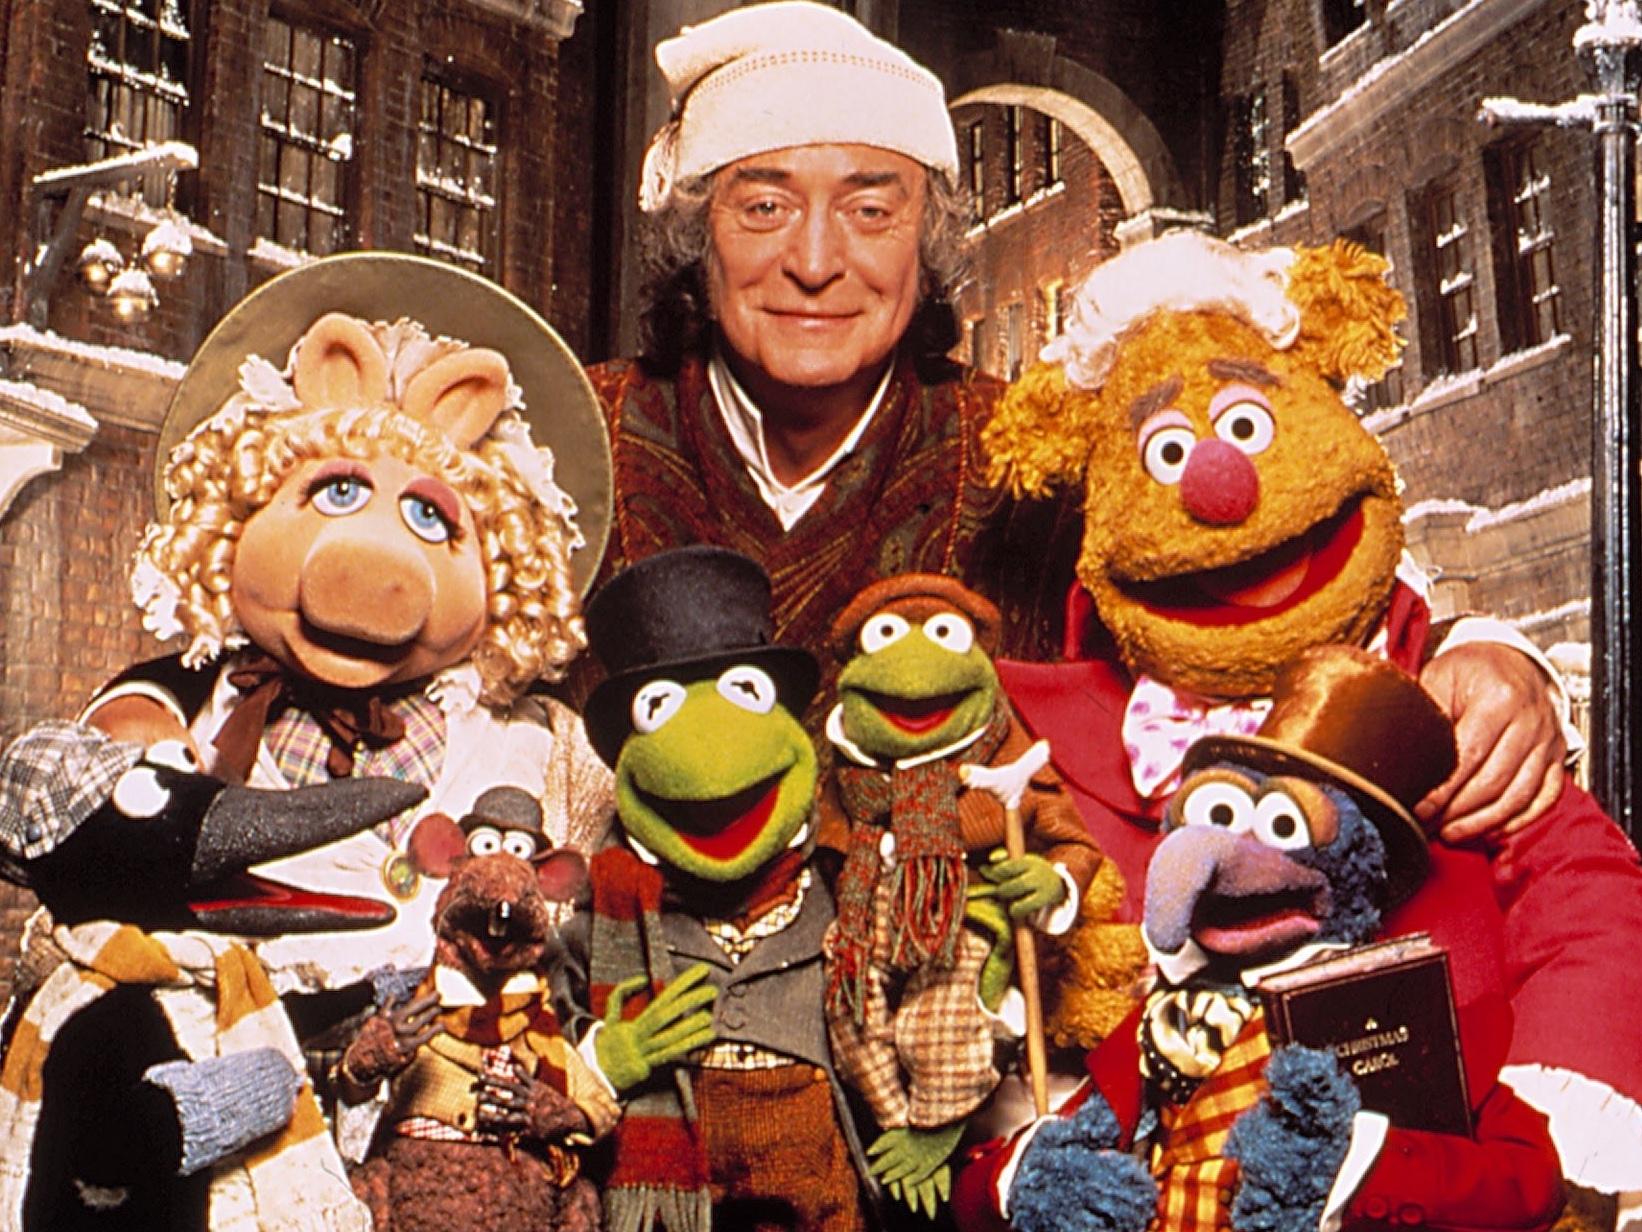 The Muppet Christmas Carol Jacob Marley.The Muppet Christmas Carol Archive Review Deconstructed